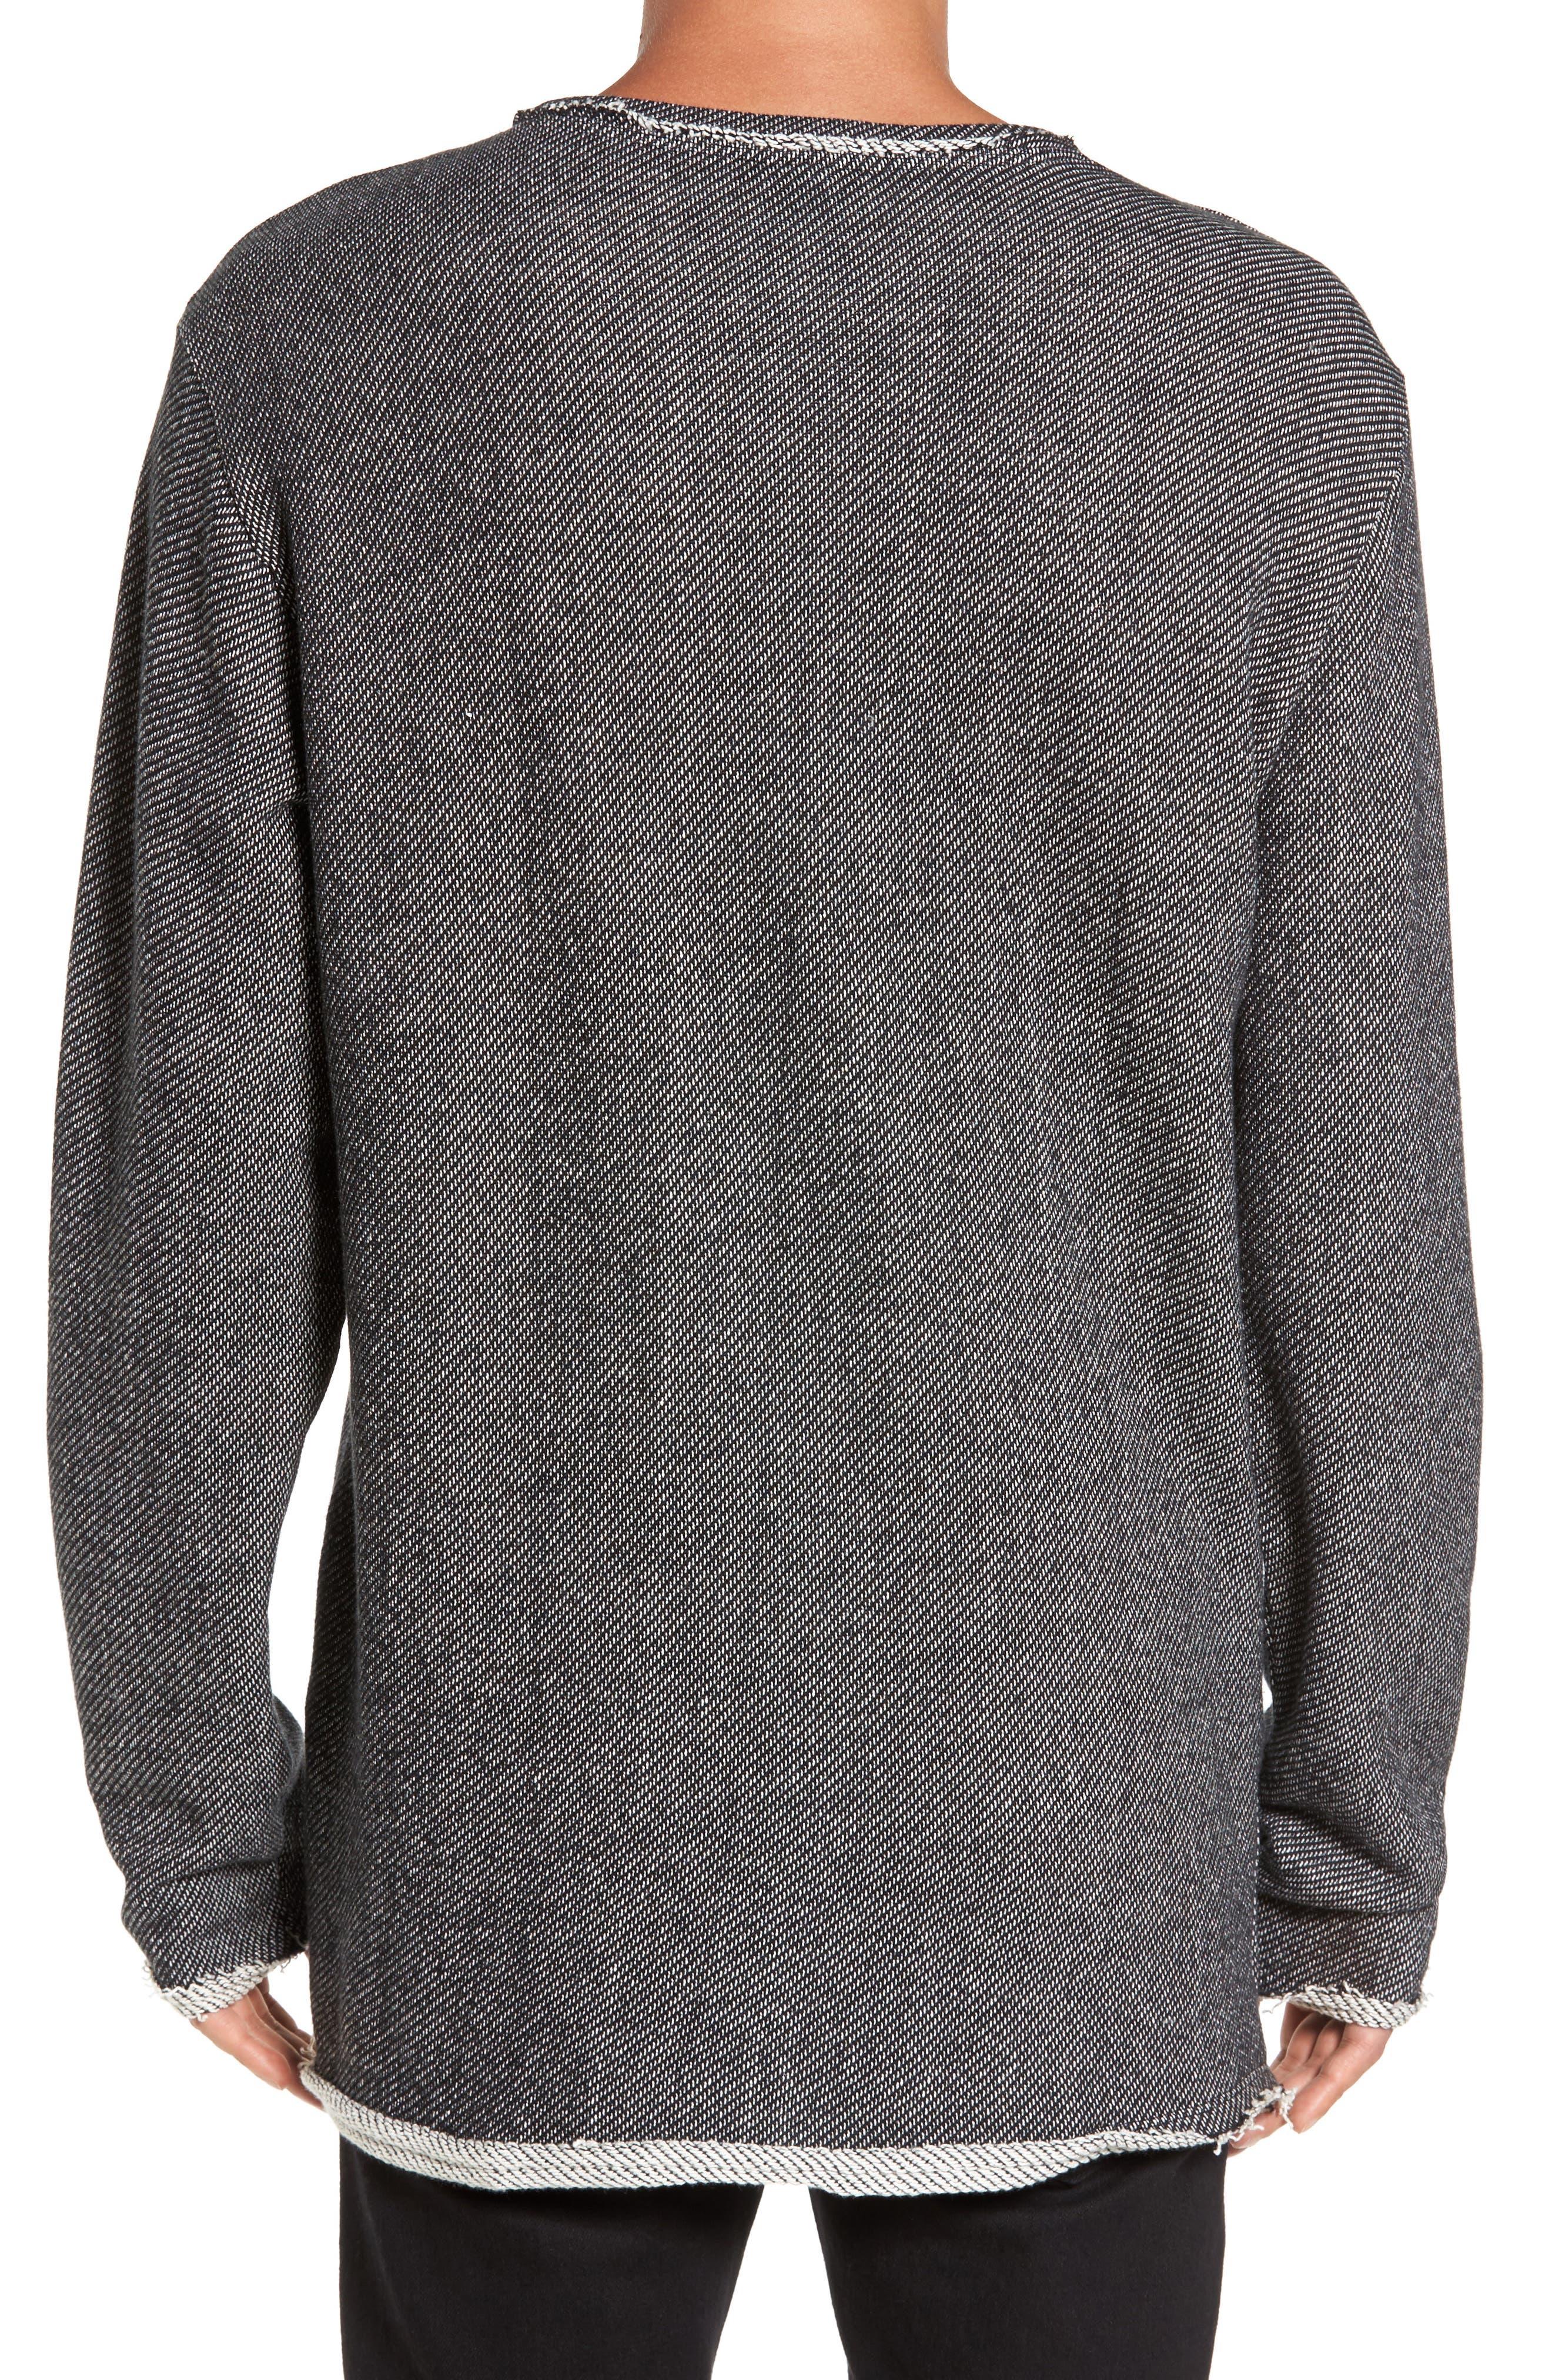 Ralf Sweater,                             Alternate thumbnail 2, color,                             001